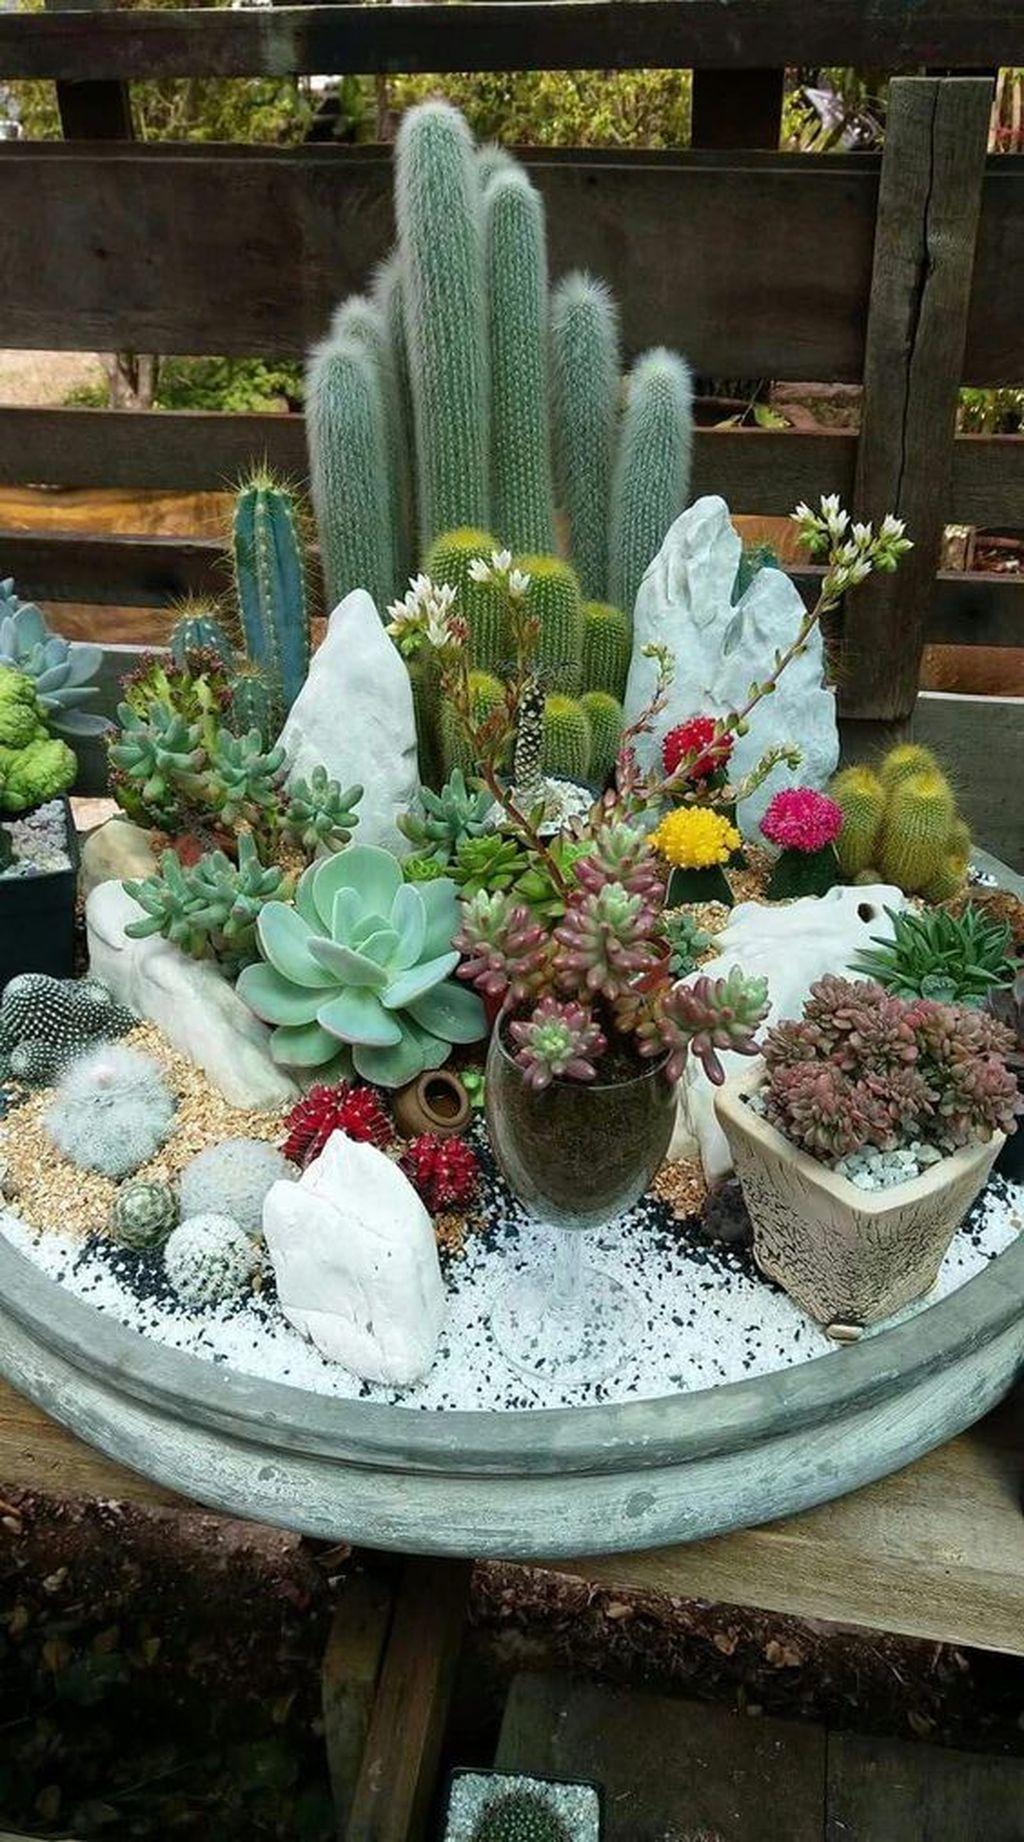 Incredible Cactus Garden Landscaping Ideas Best For Summer 15